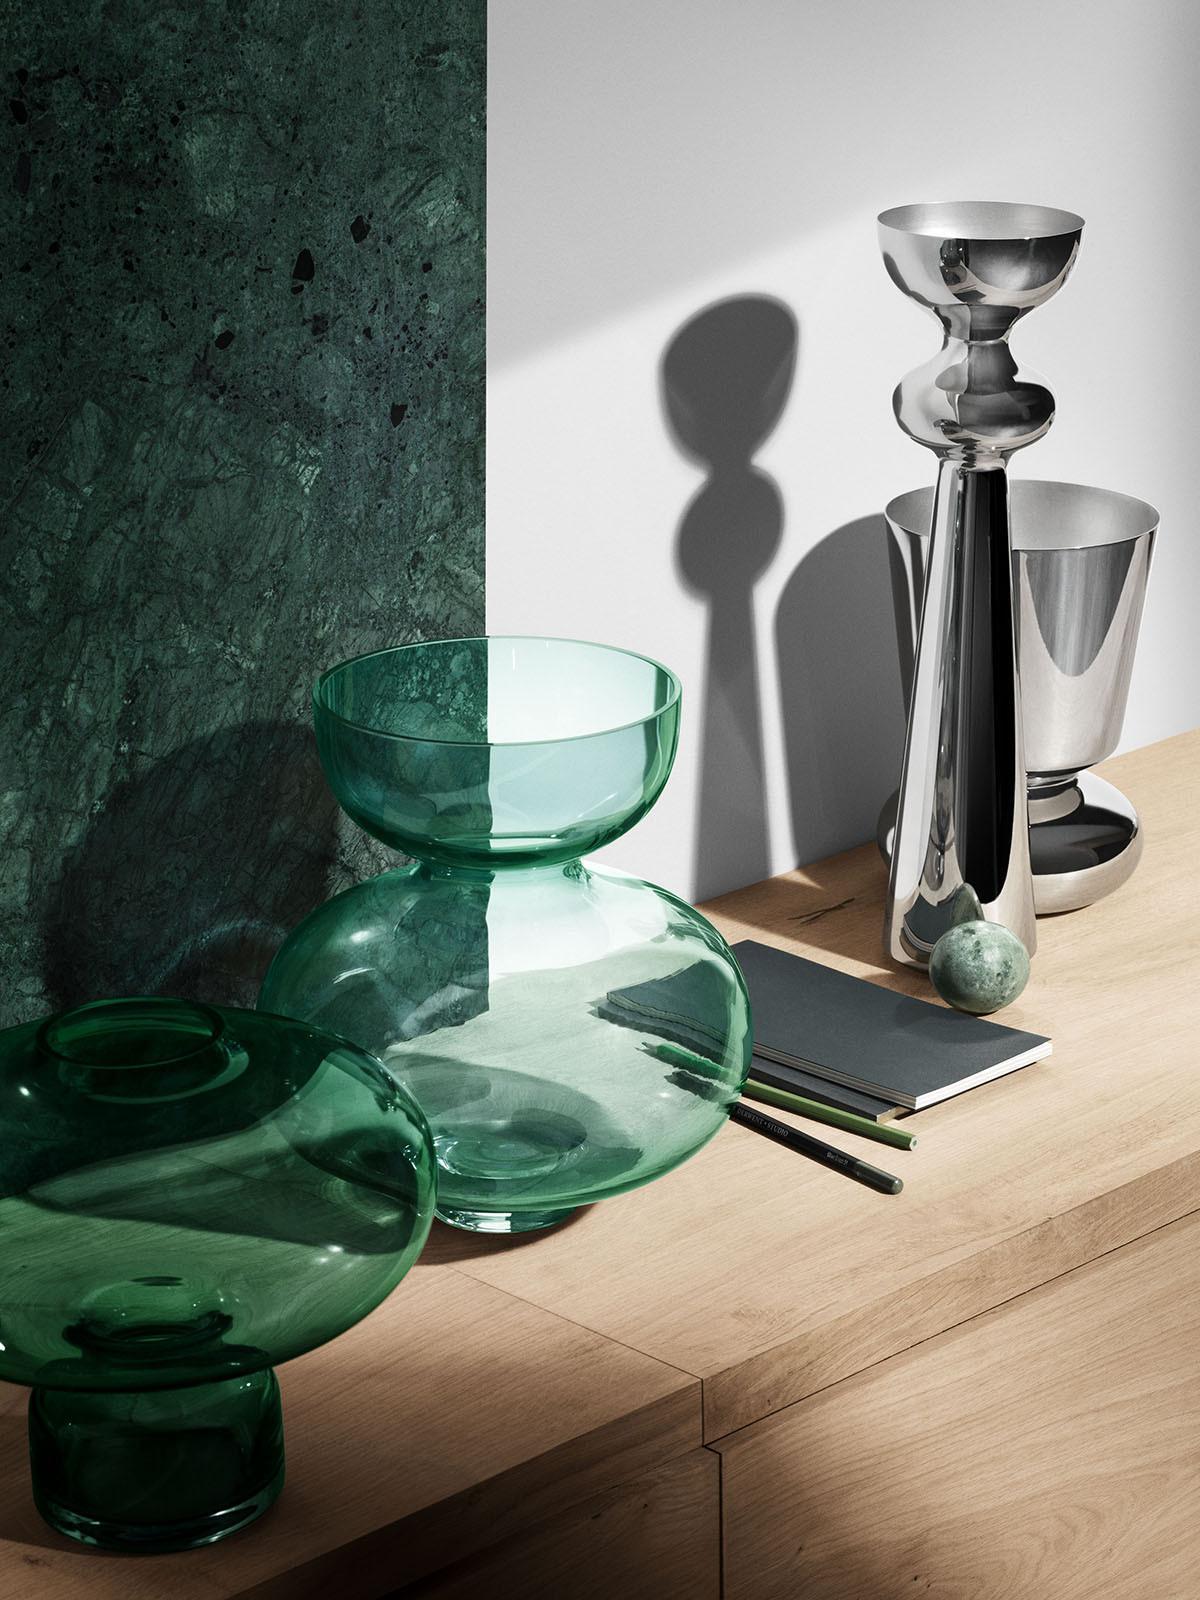 george jensen vase of alfredo ha¤berli design development alfredo living collection pertaining to alfredo living collection 2015 range of vases georg jensen